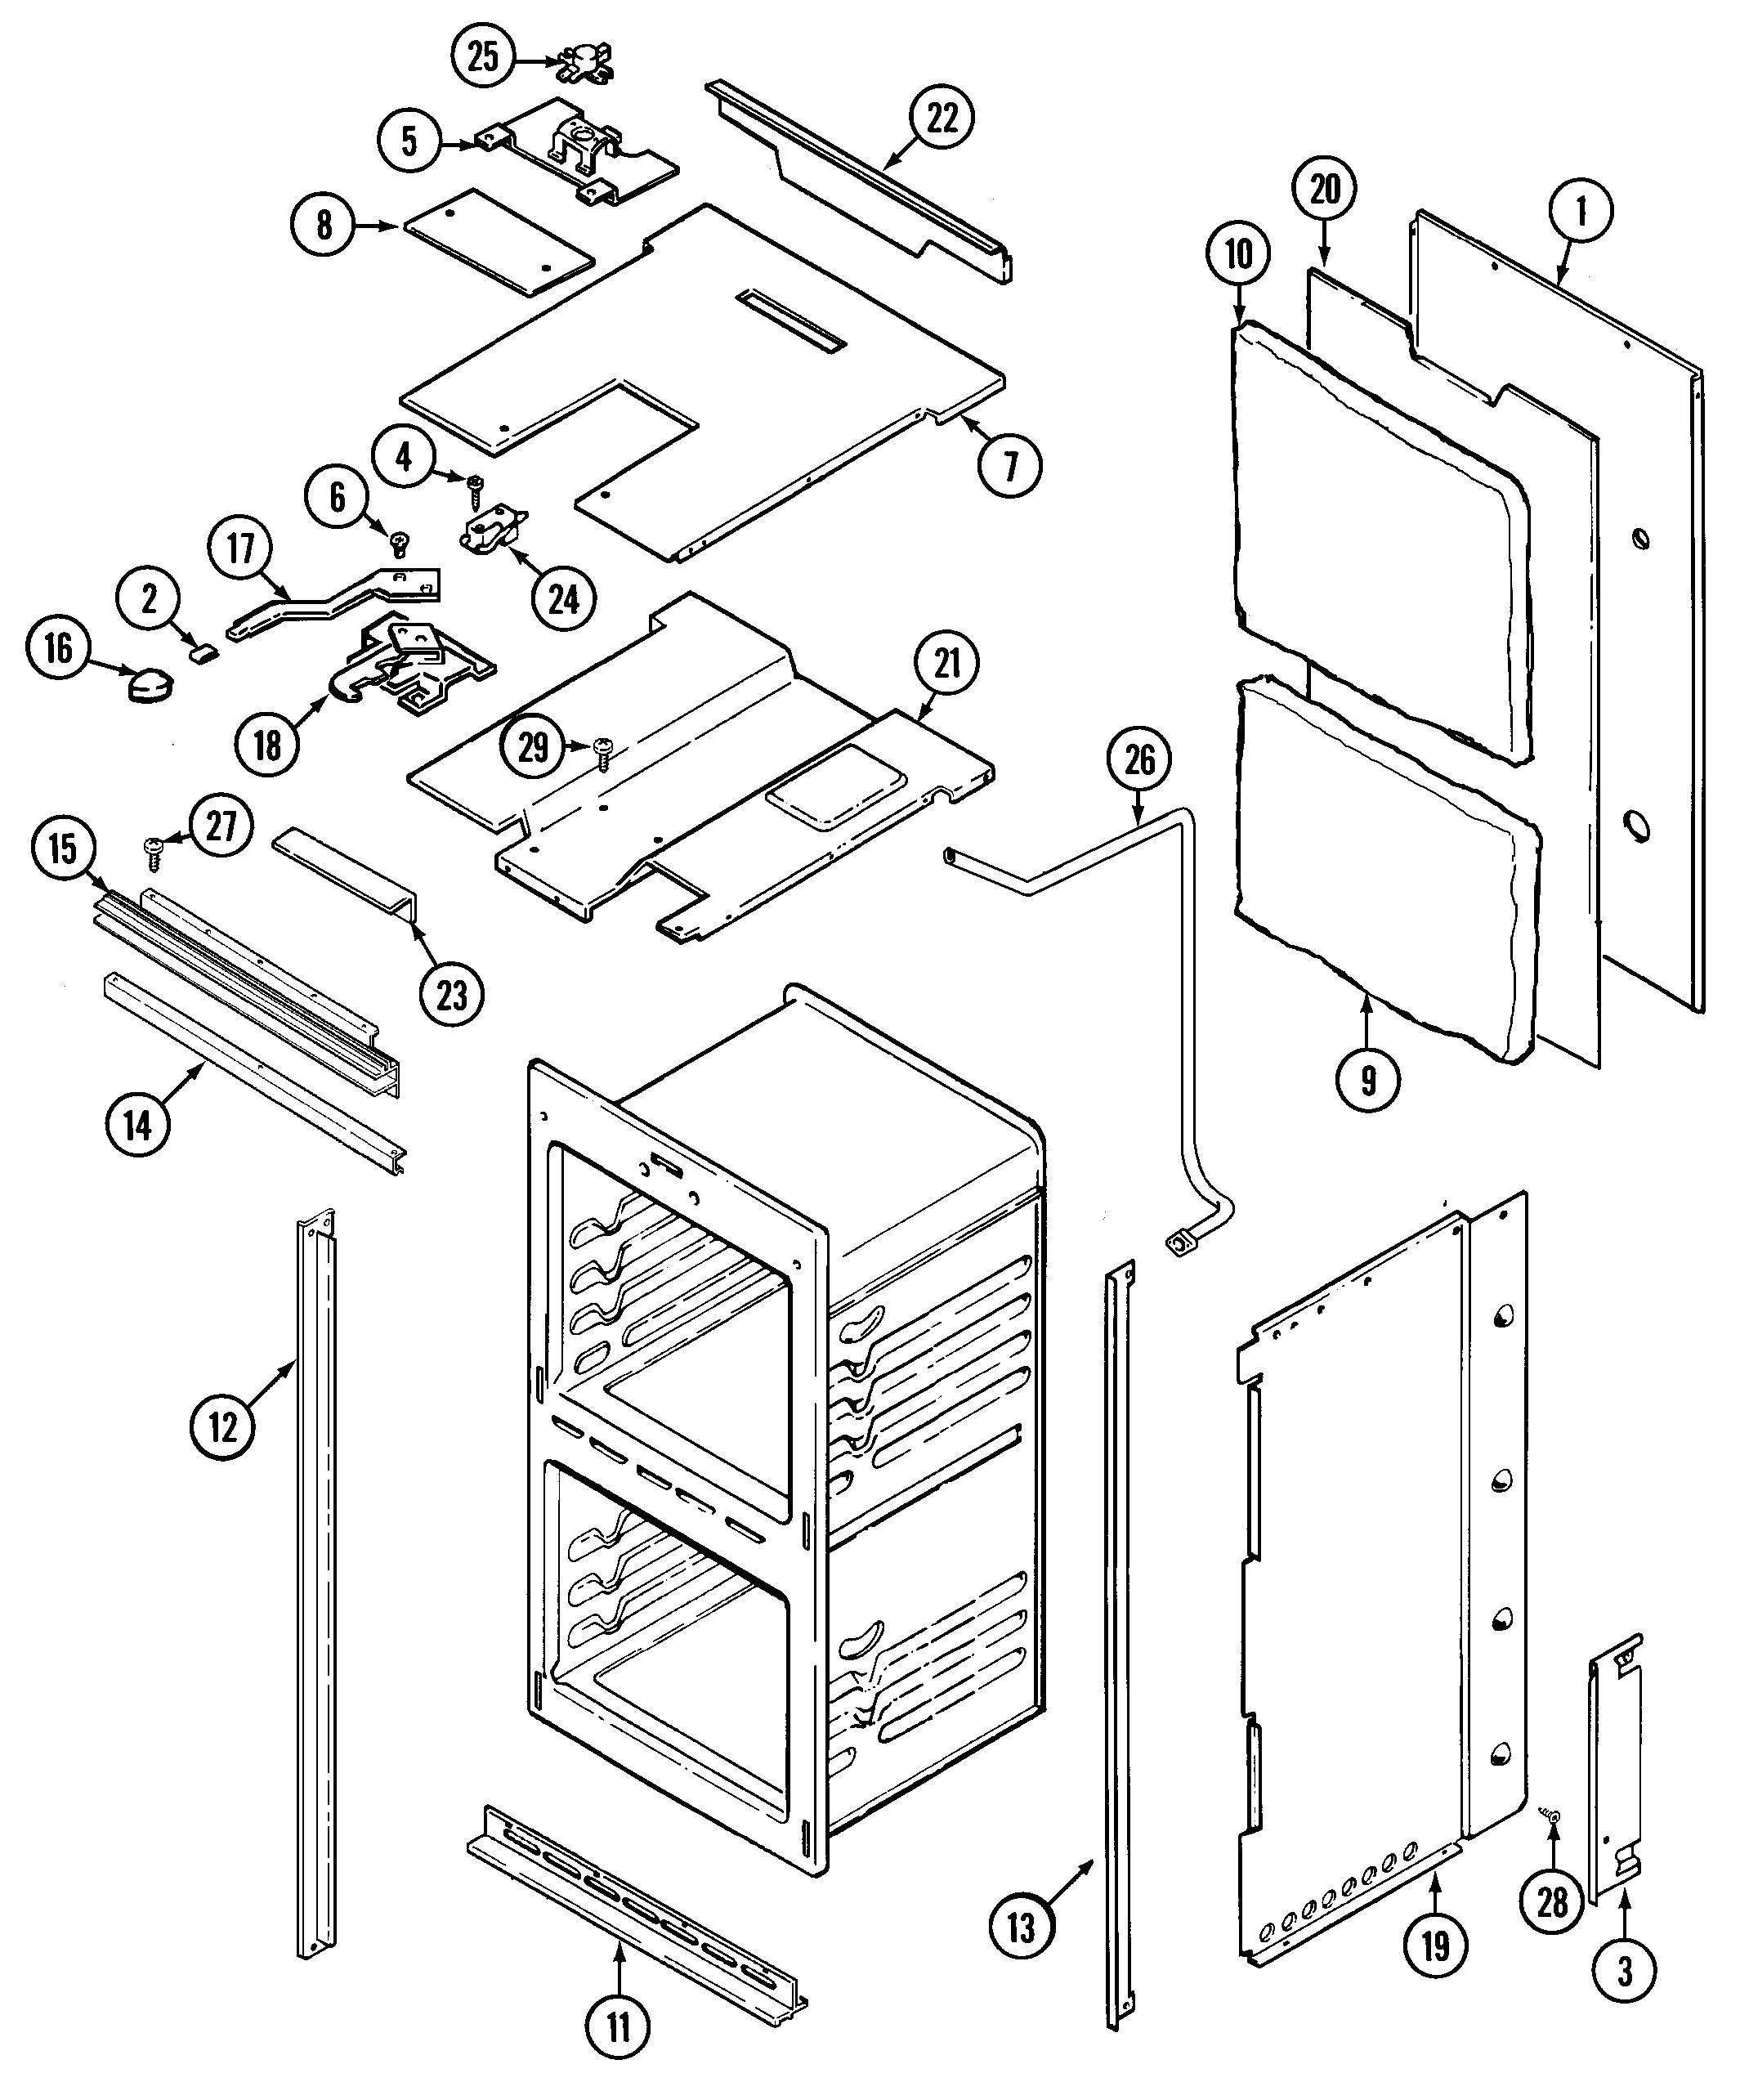 Rn 5982 Magic Chef Microwave Wiring Diagram Schematic Wiring